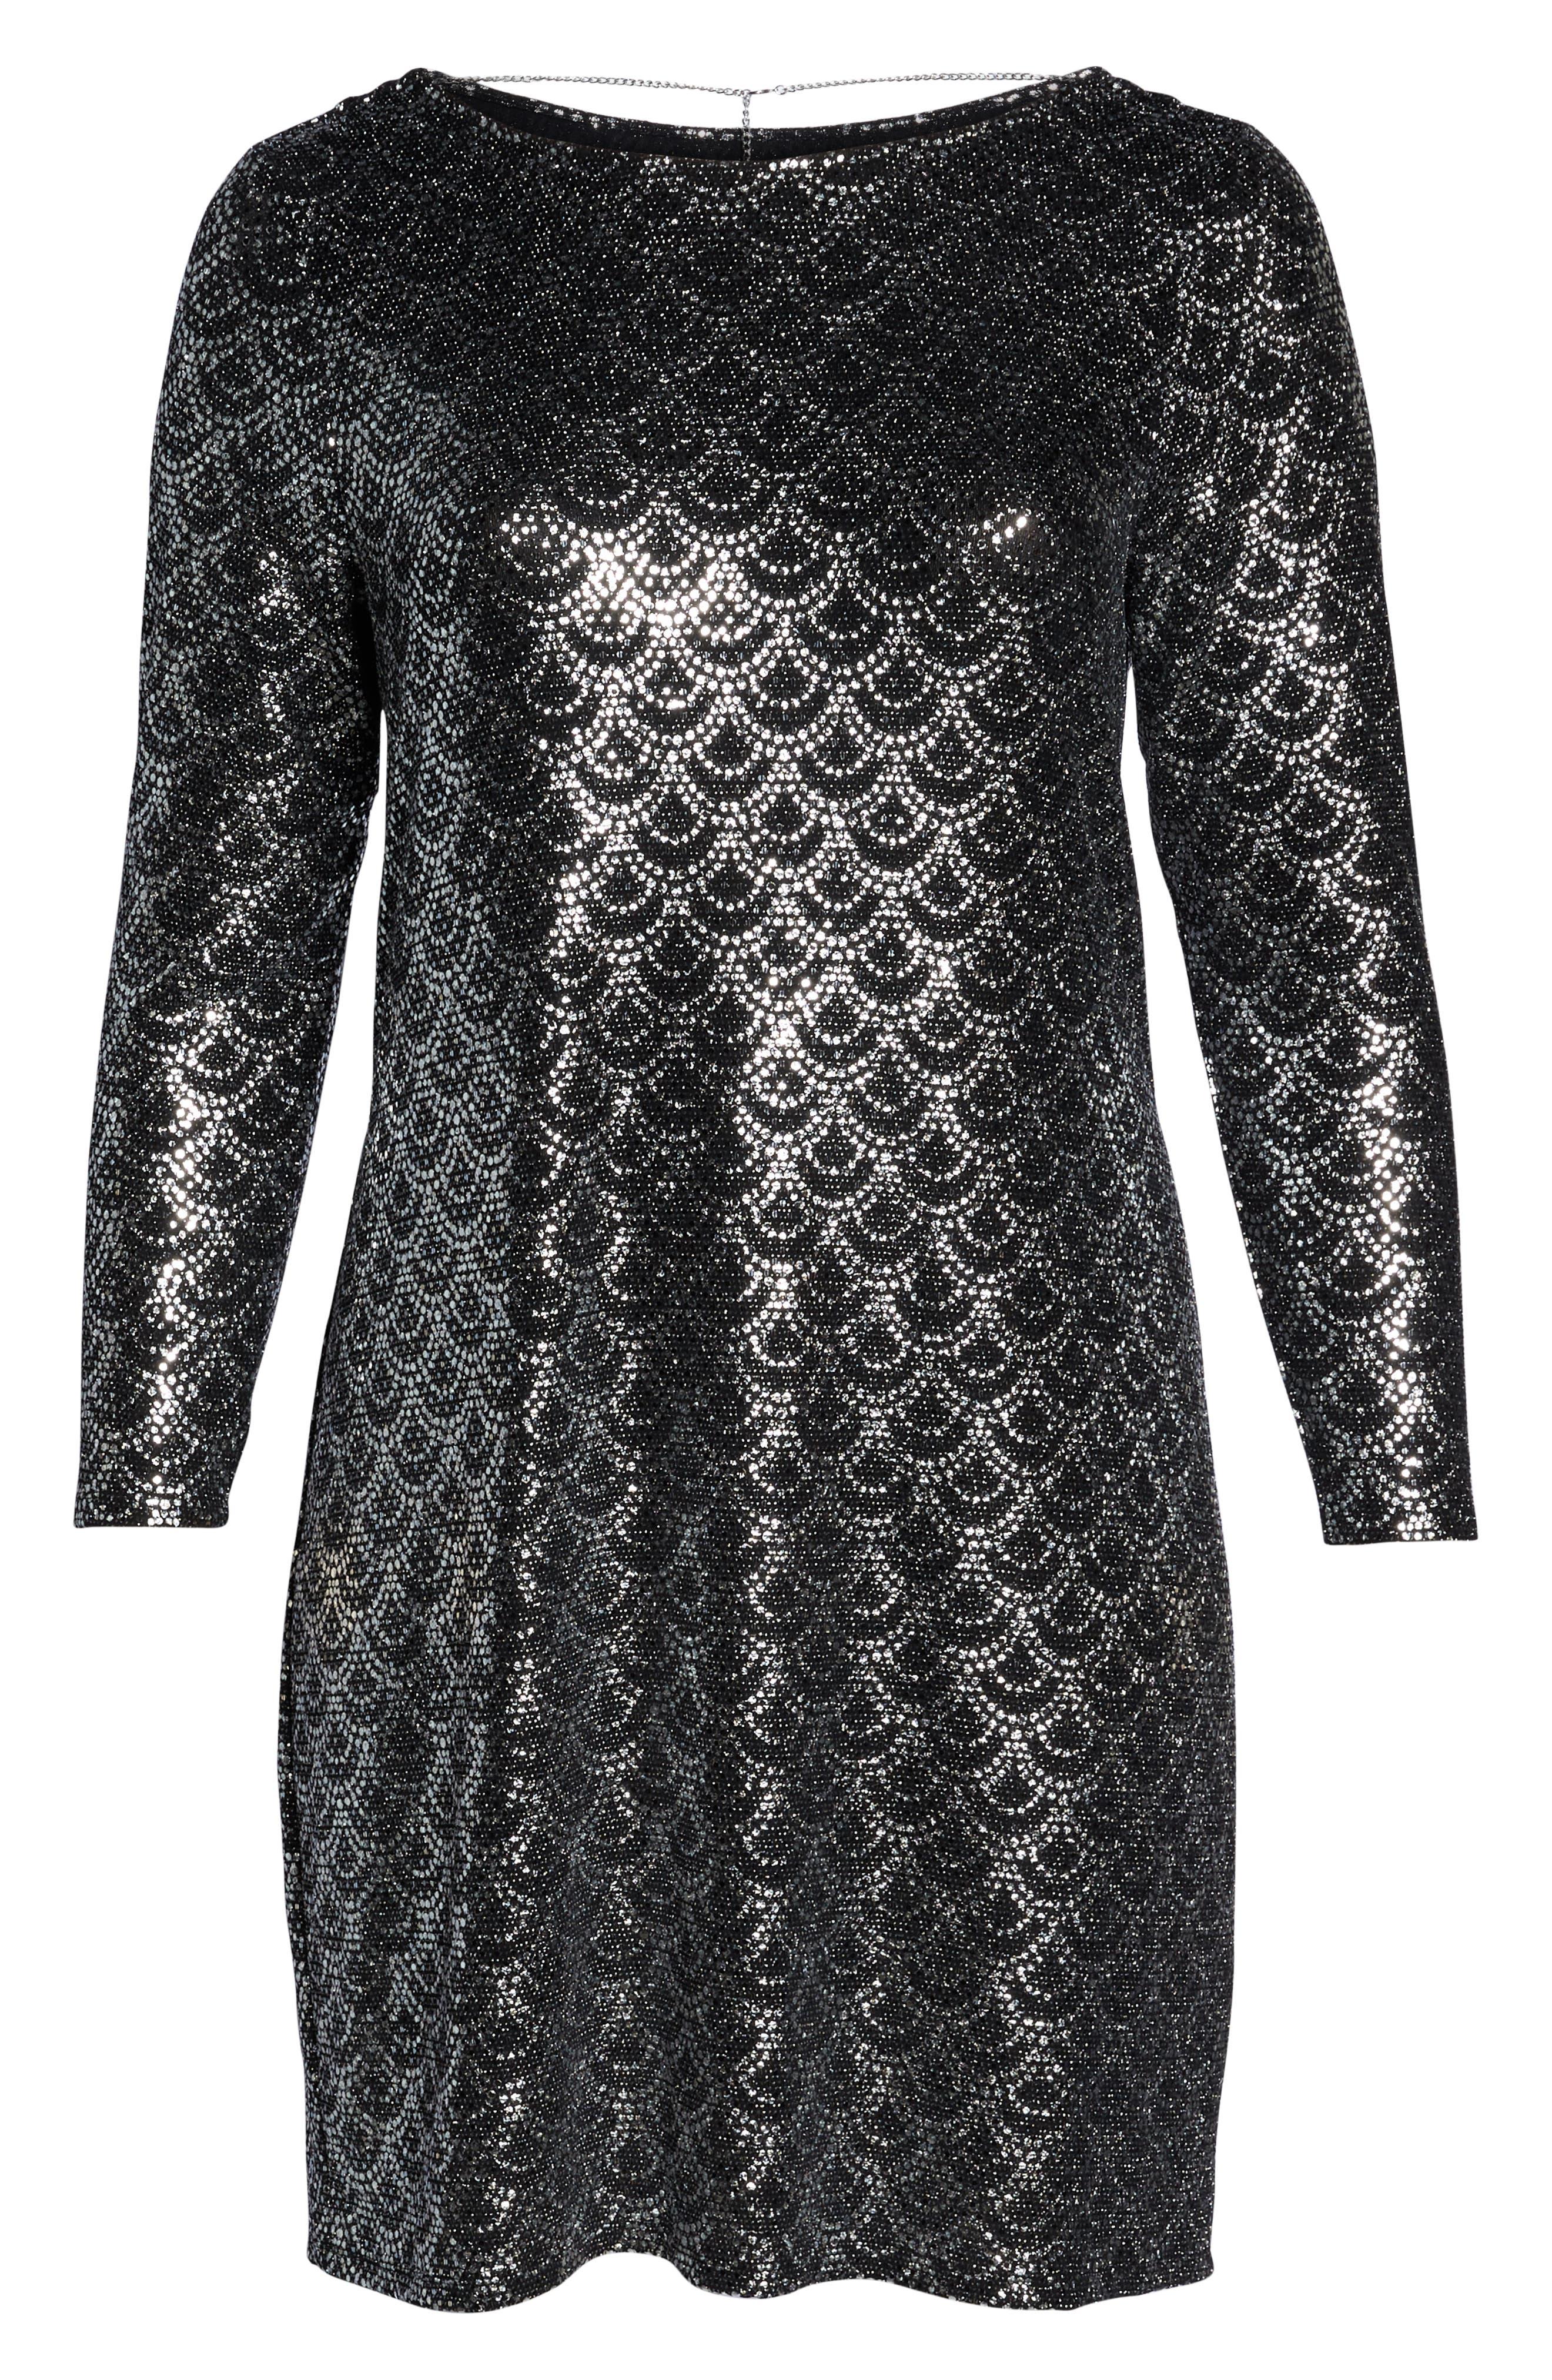 Glitter Knit Shift Dress,                             Alternate thumbnail 7, color,                             001